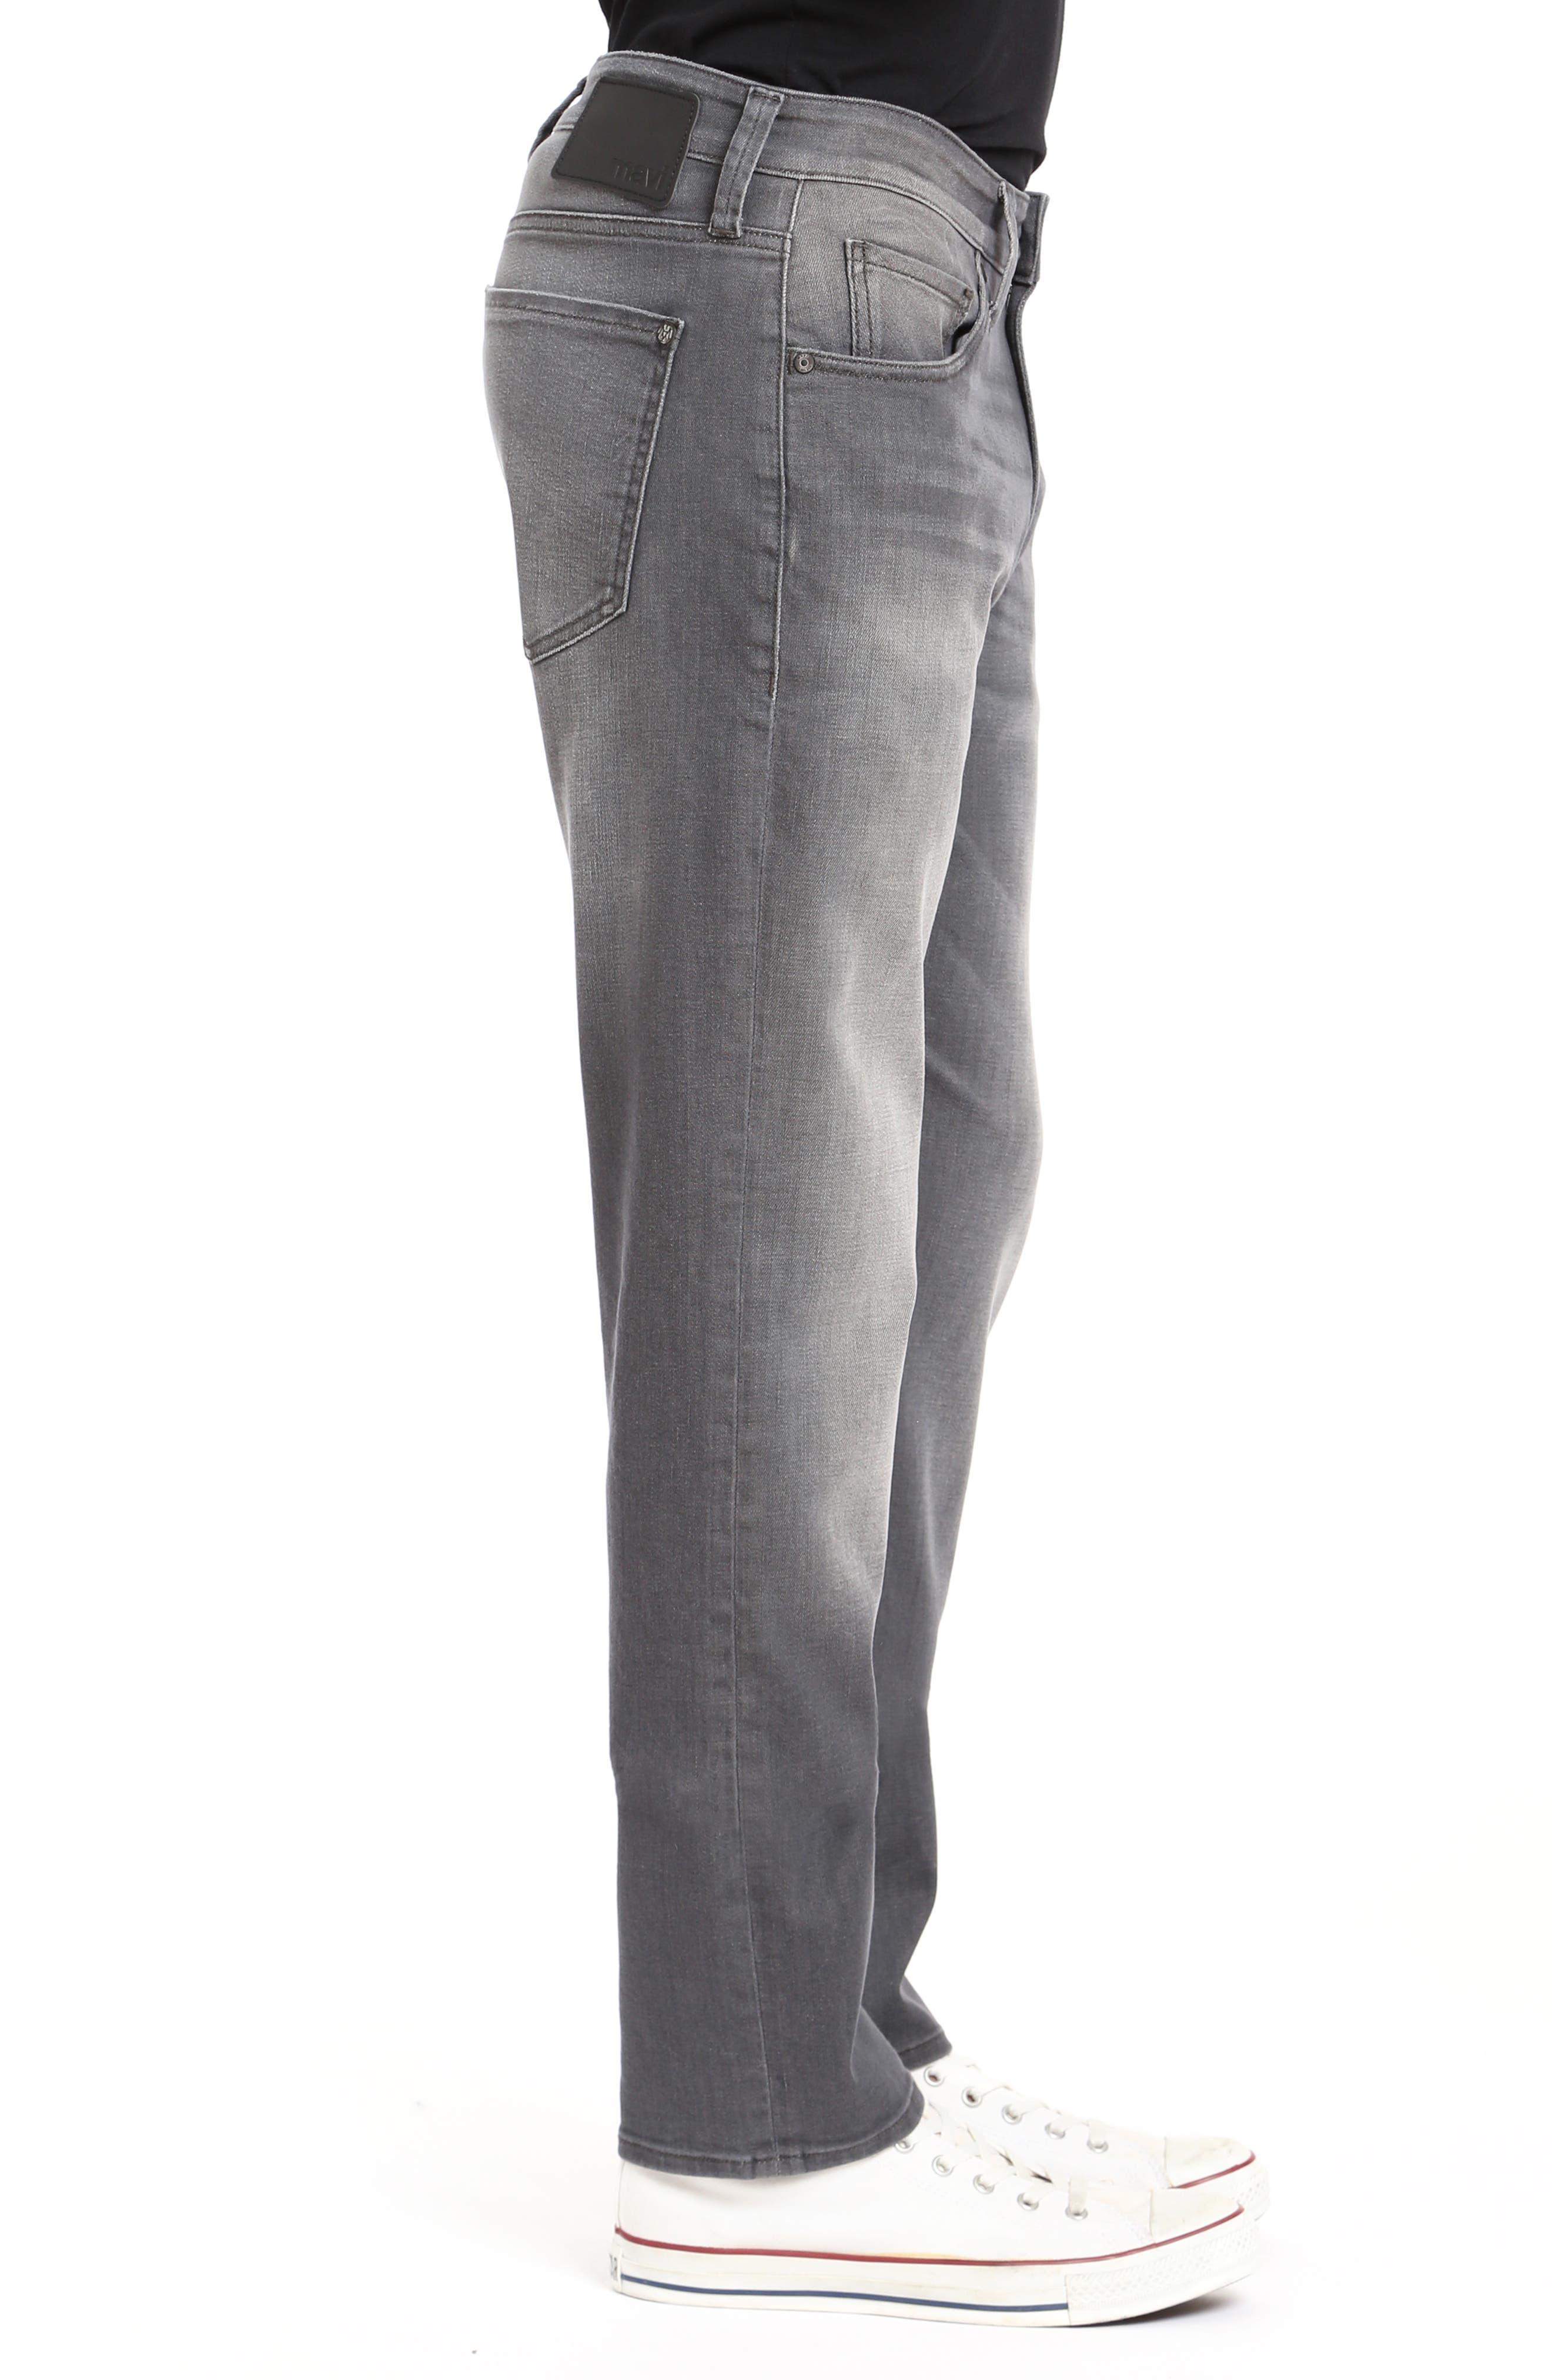 Zach Straight Leg Jeans,                             Alternate thumbnail 3, color,                             LIGHT GREY BROOKLYN